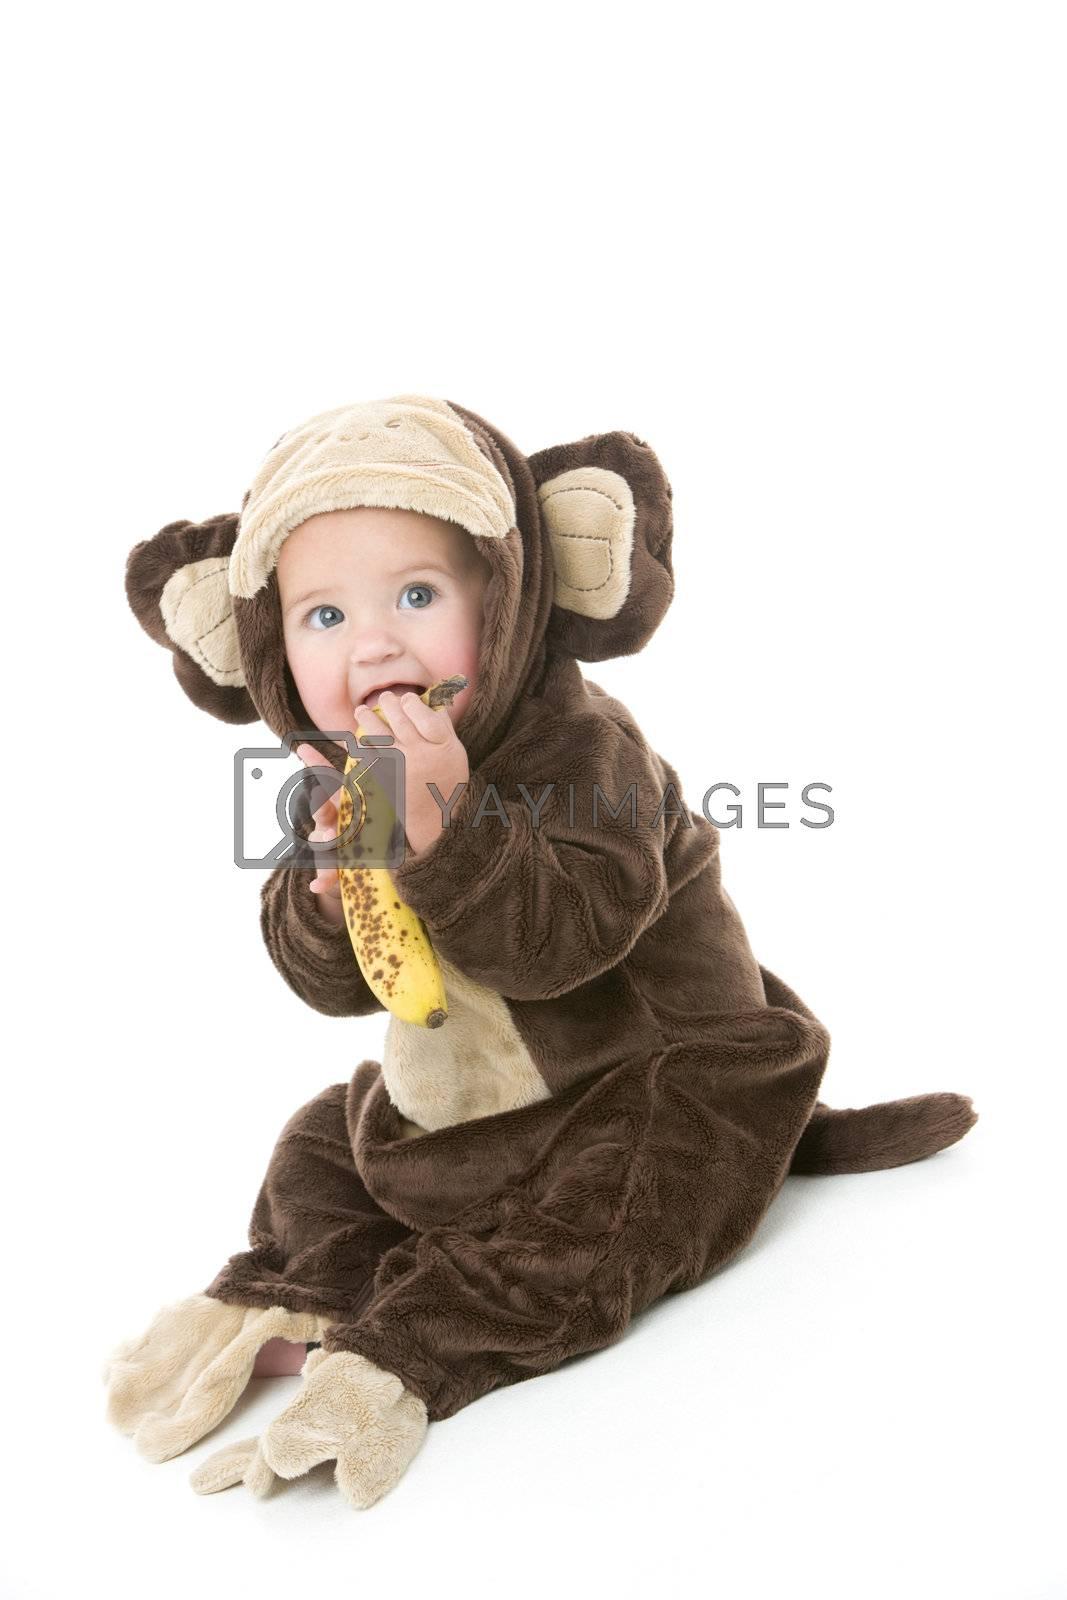 Baby in monkey costume holding banana